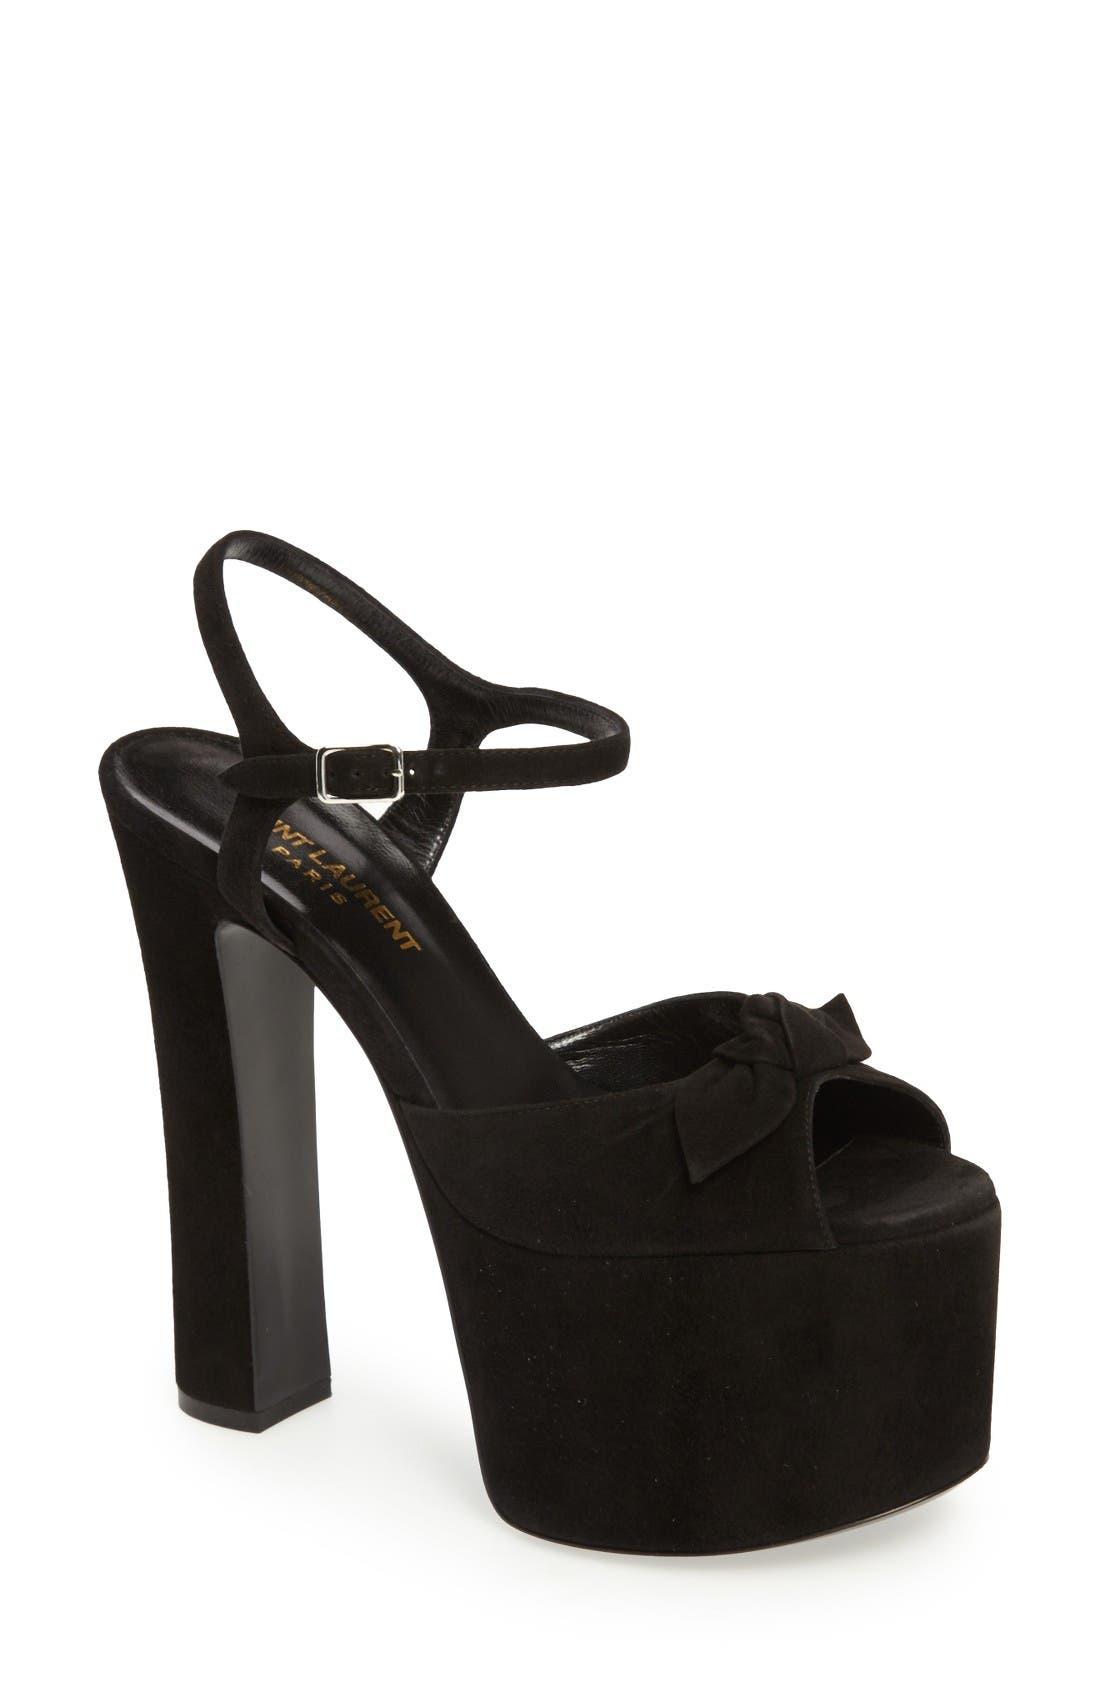 Alternate Image 1 Selected - Saint Laurent Betty Platform Sandal (Women)